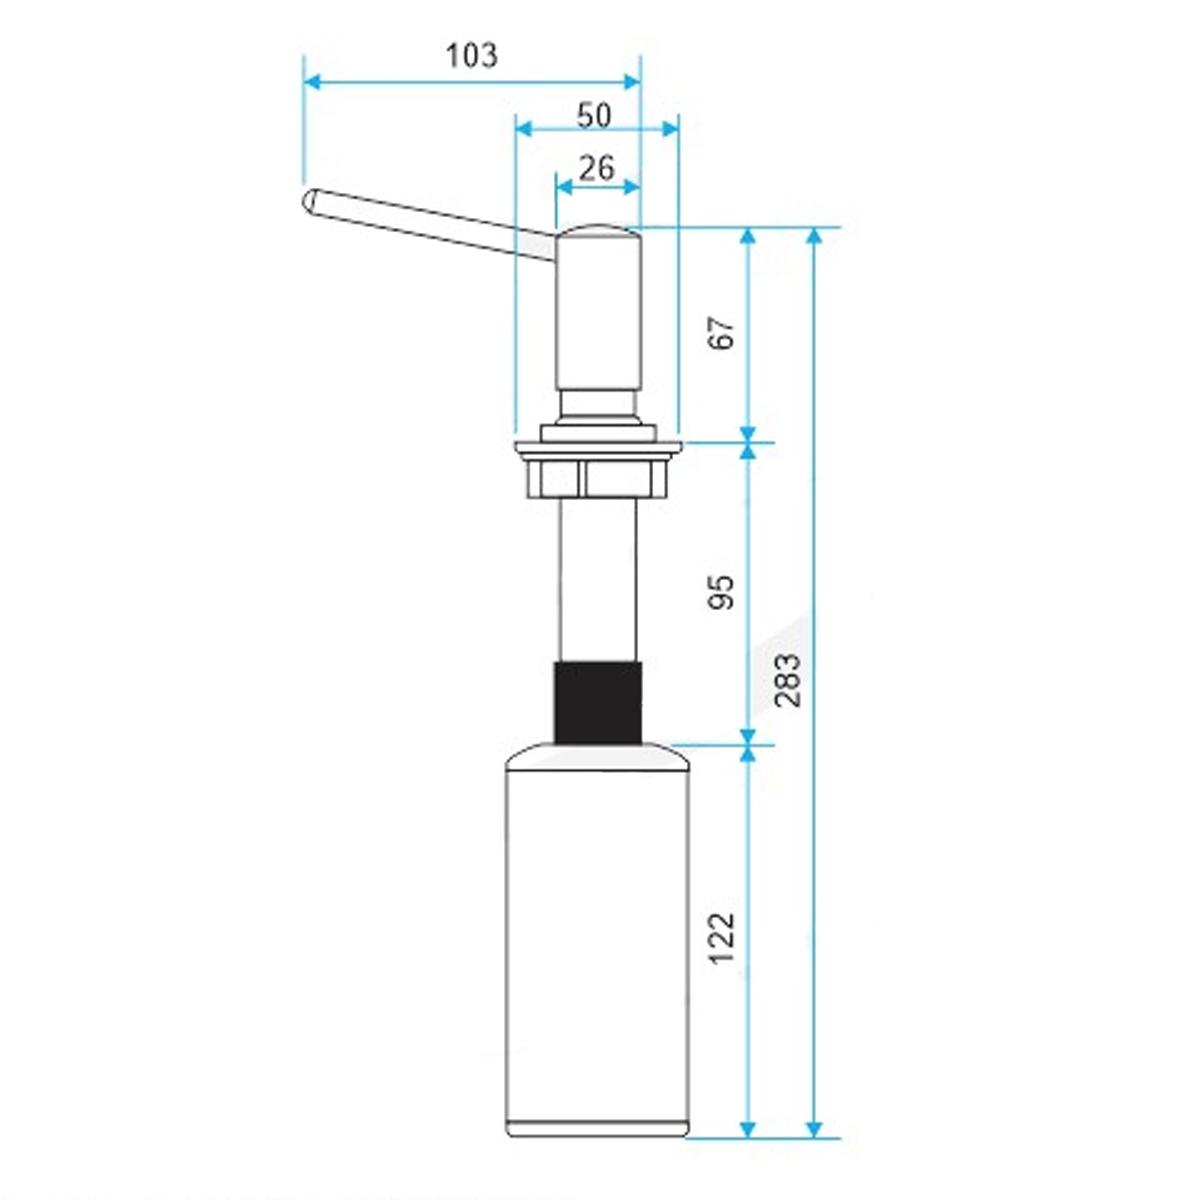 Dosador de Sabão Westing Aço Inox 304 C/ Recipiente Plástico para Bancada Embutir 500ml